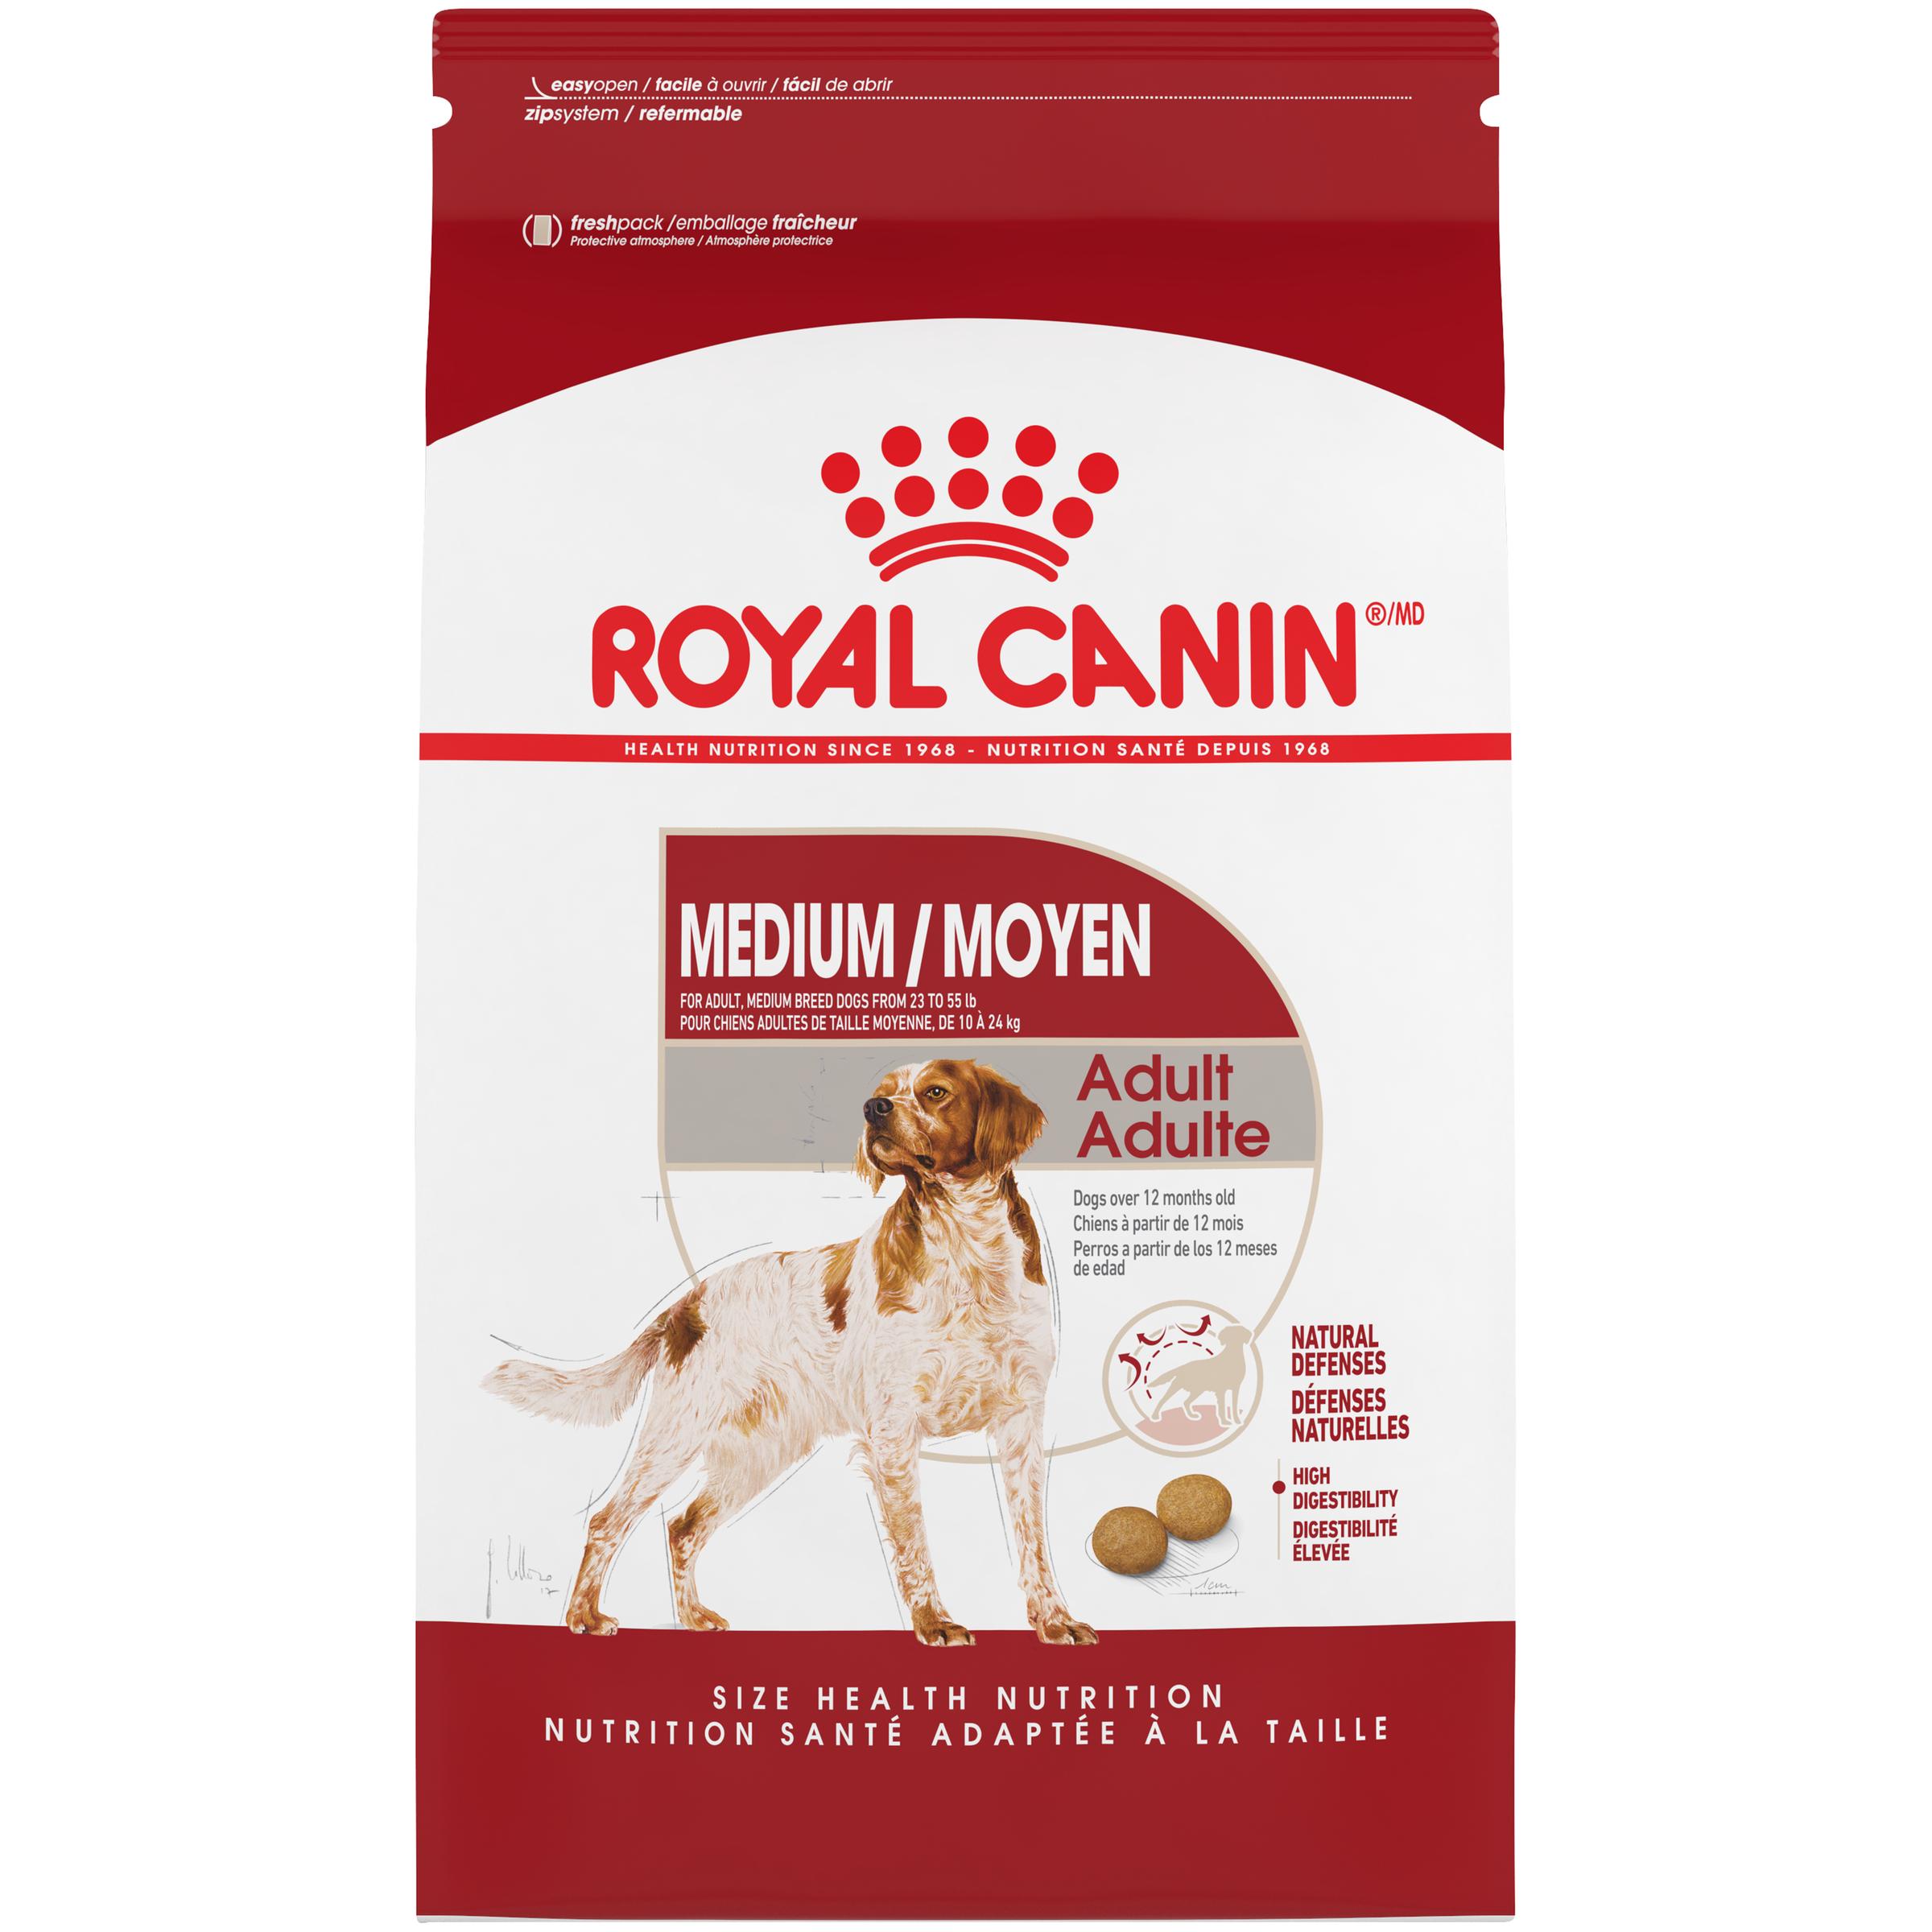 Royal Canin SHN Medium Adult Dry Dog Food Image